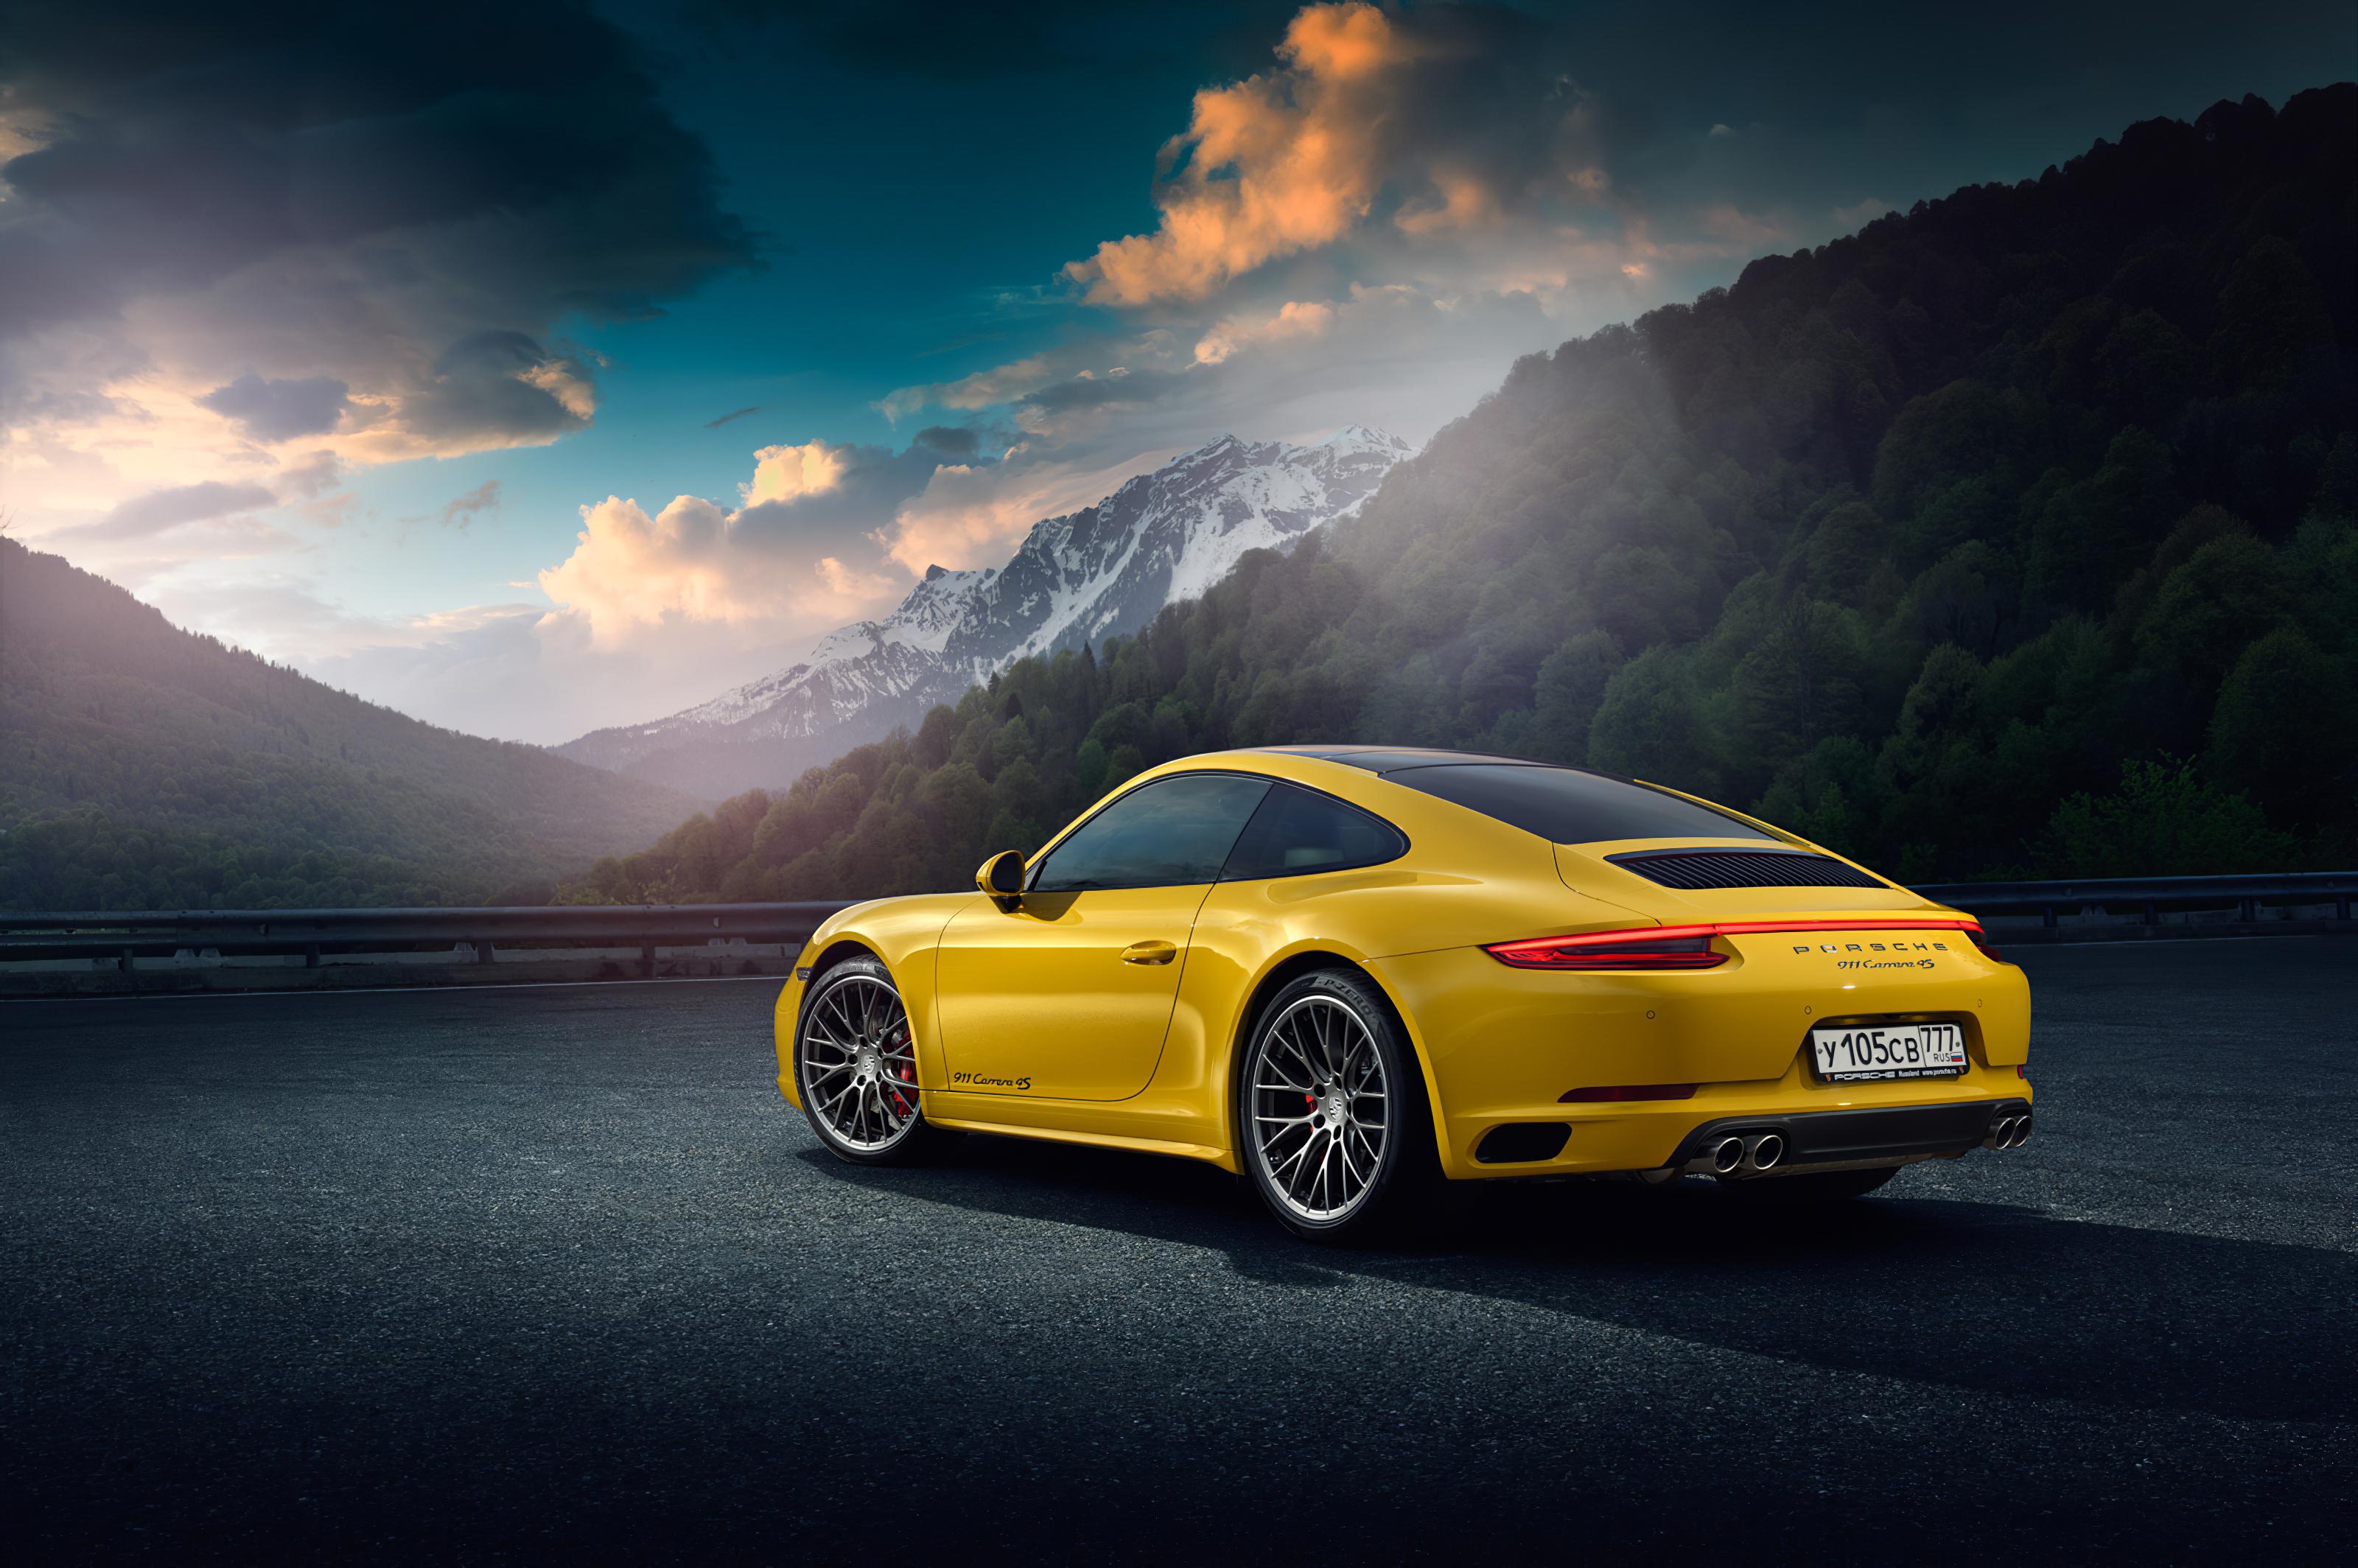 Yellow Porsche 918 Rear, HD Cars, 4k Wallpapers, Images ...